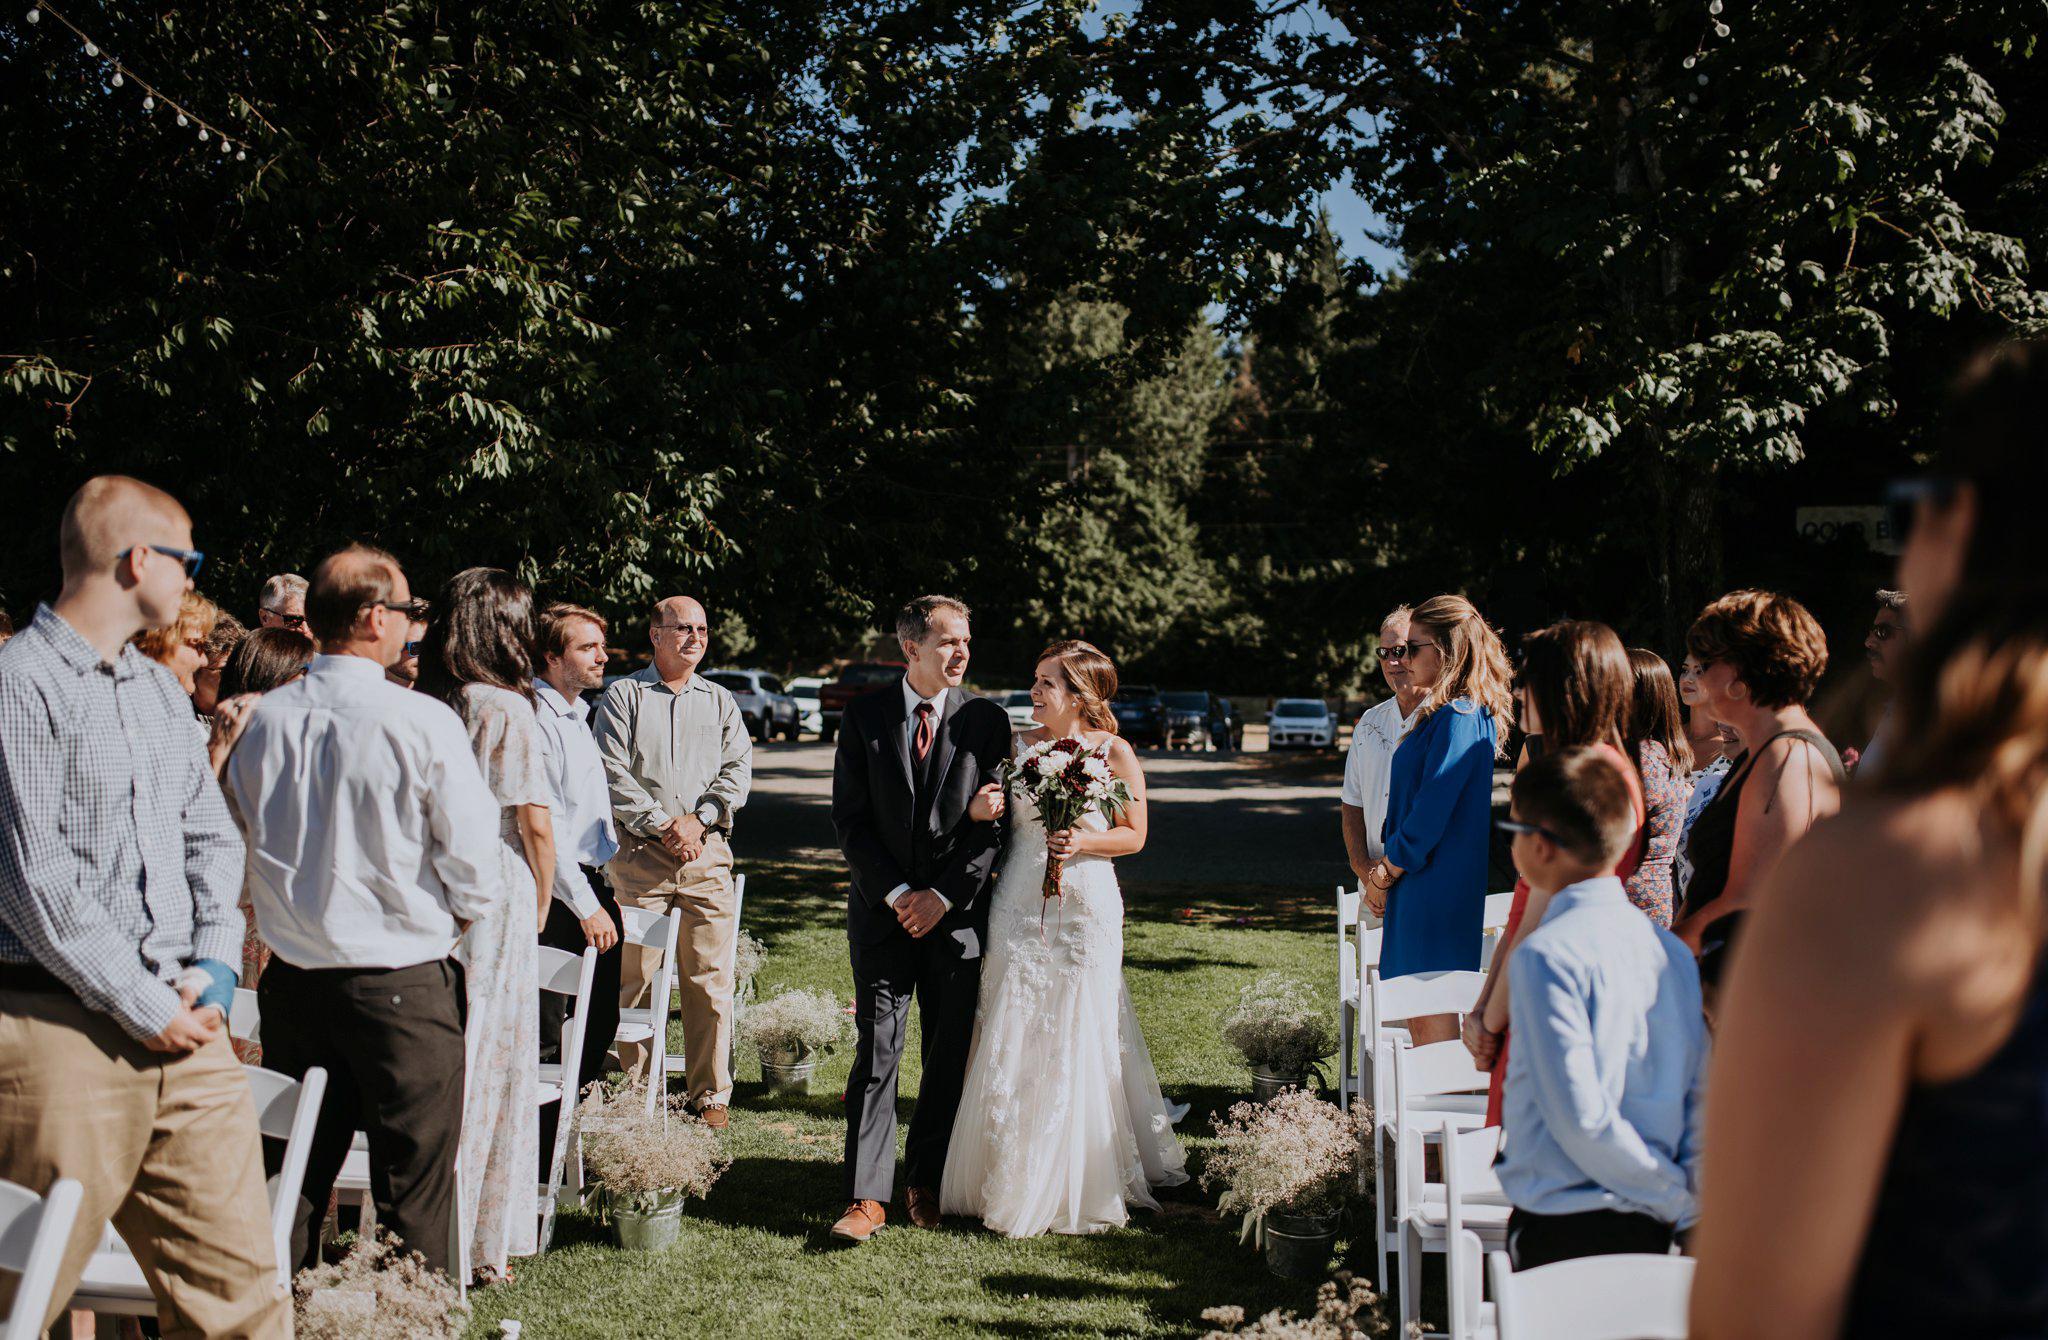 kristen-and-cody-the-kelley-farm-wedding-seattle-photographer-caitlyn-nikula-57.jpg